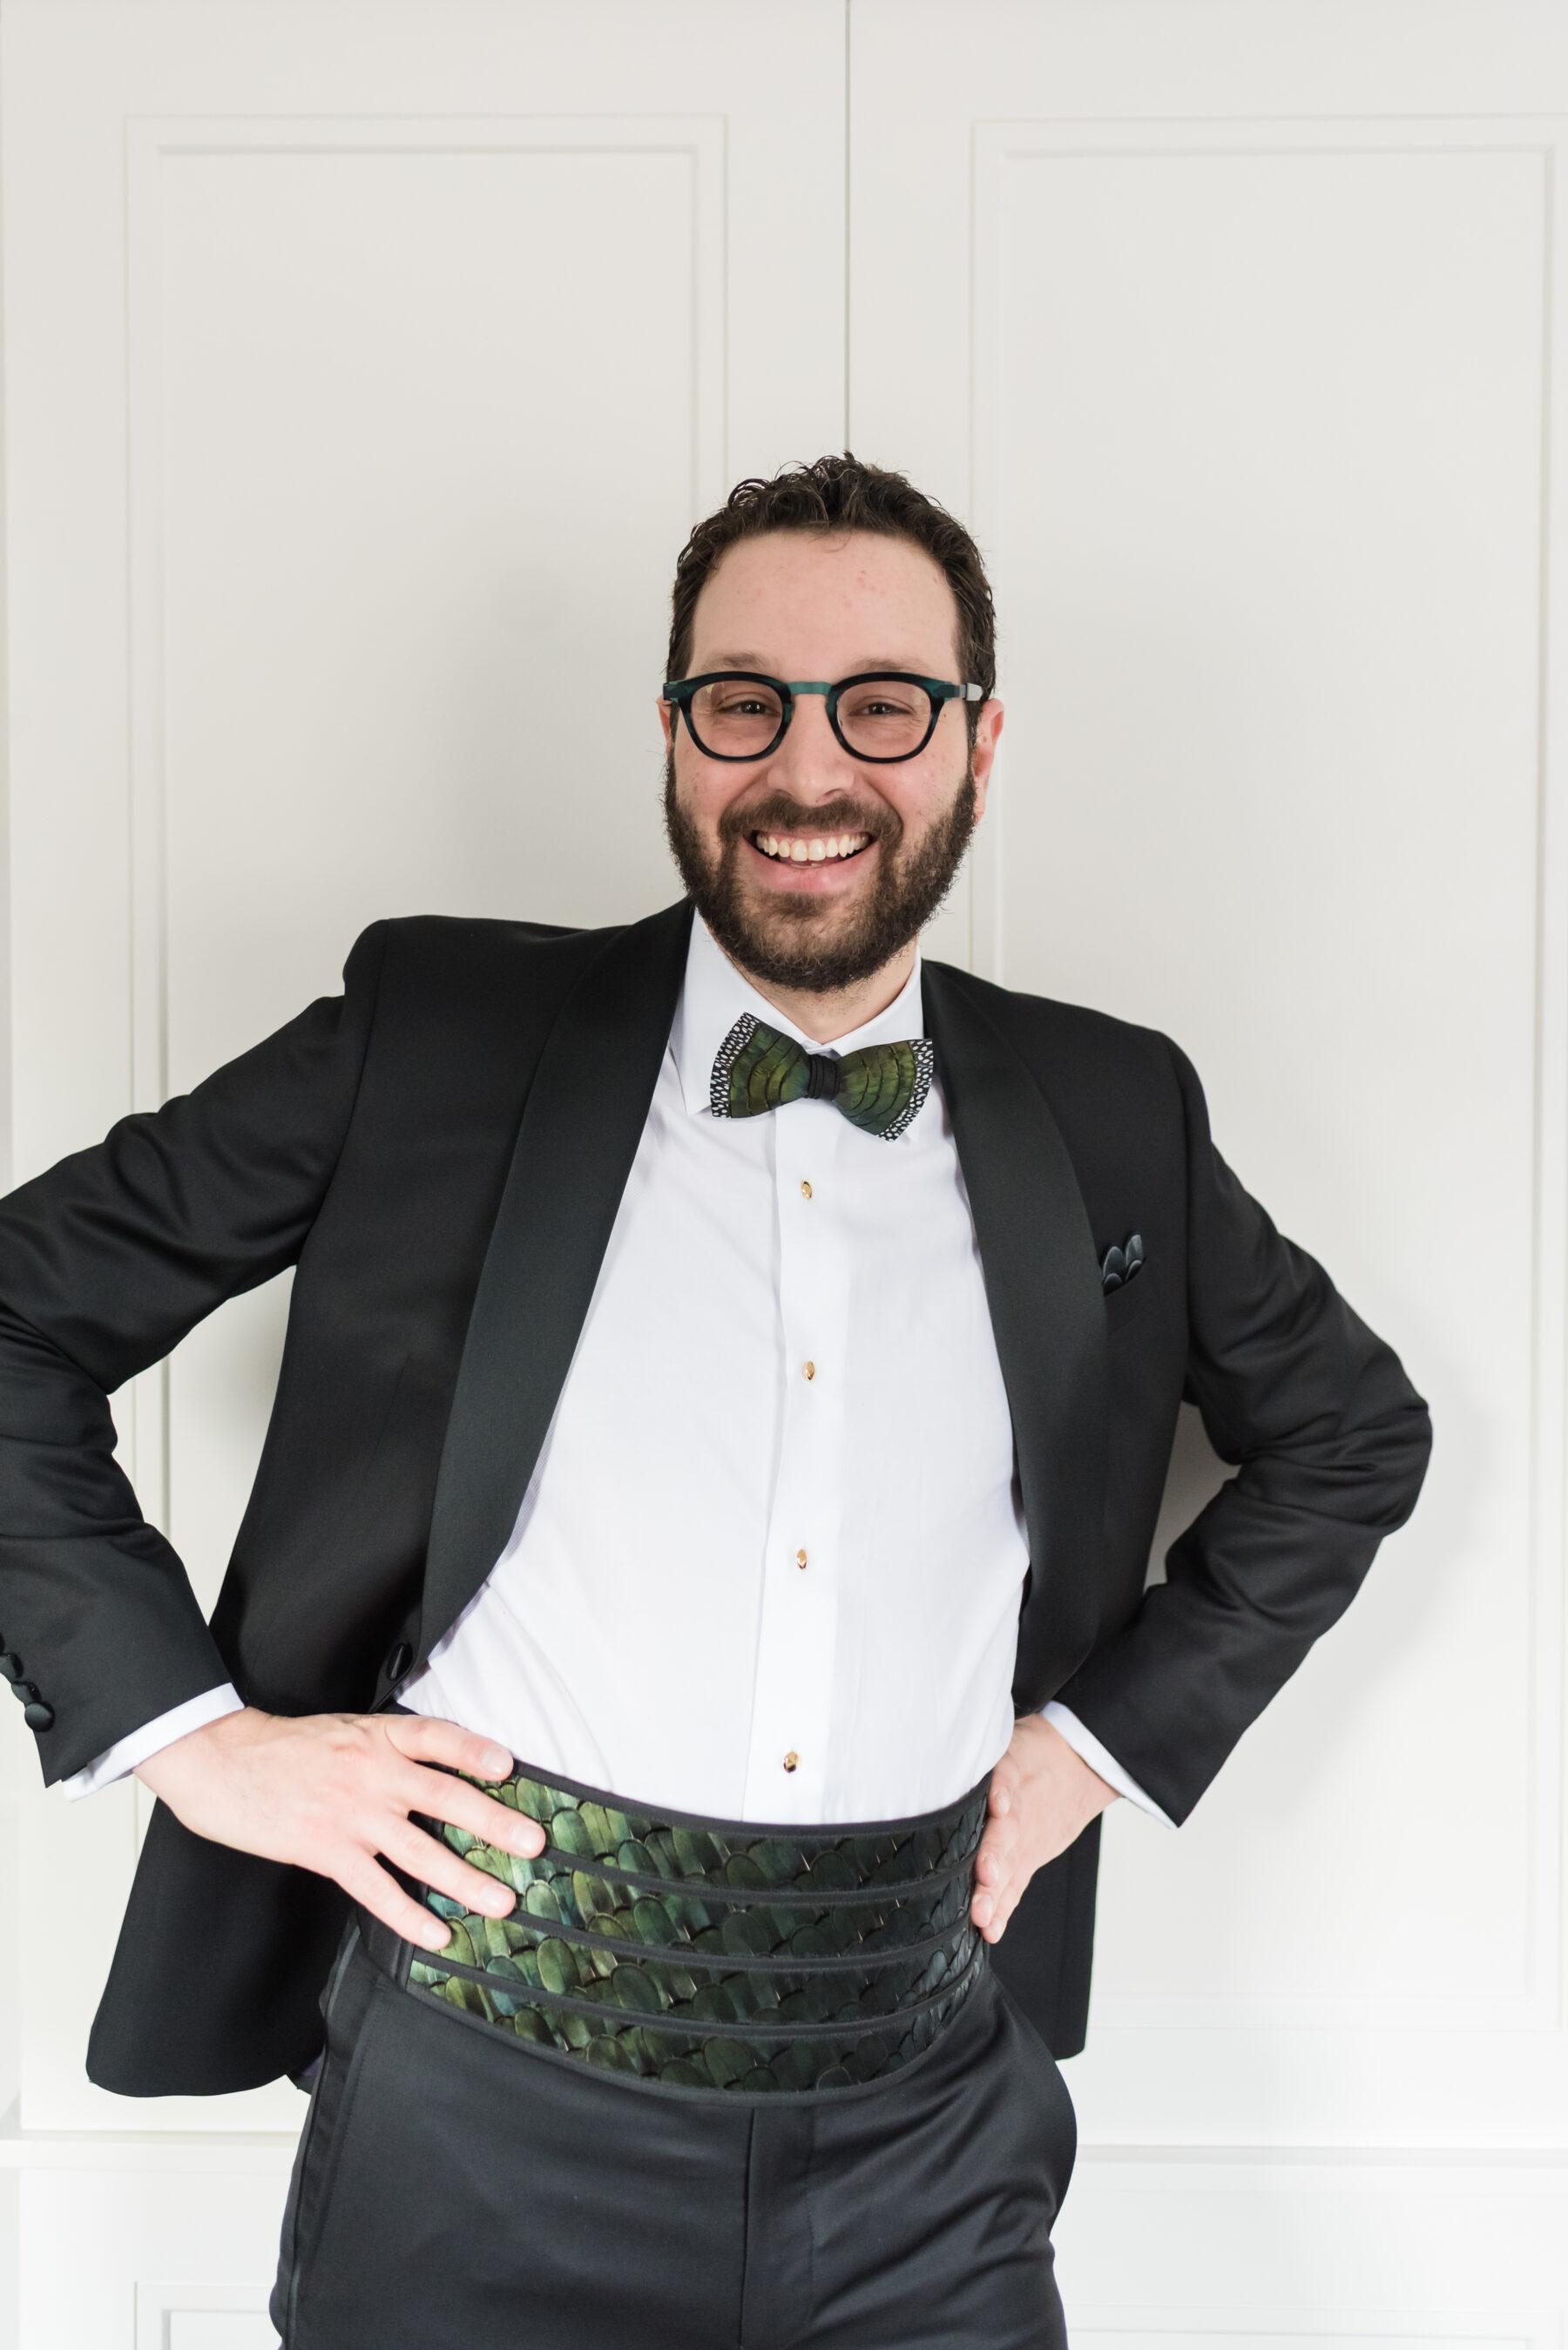 Modern green tuxedo with cumberbund